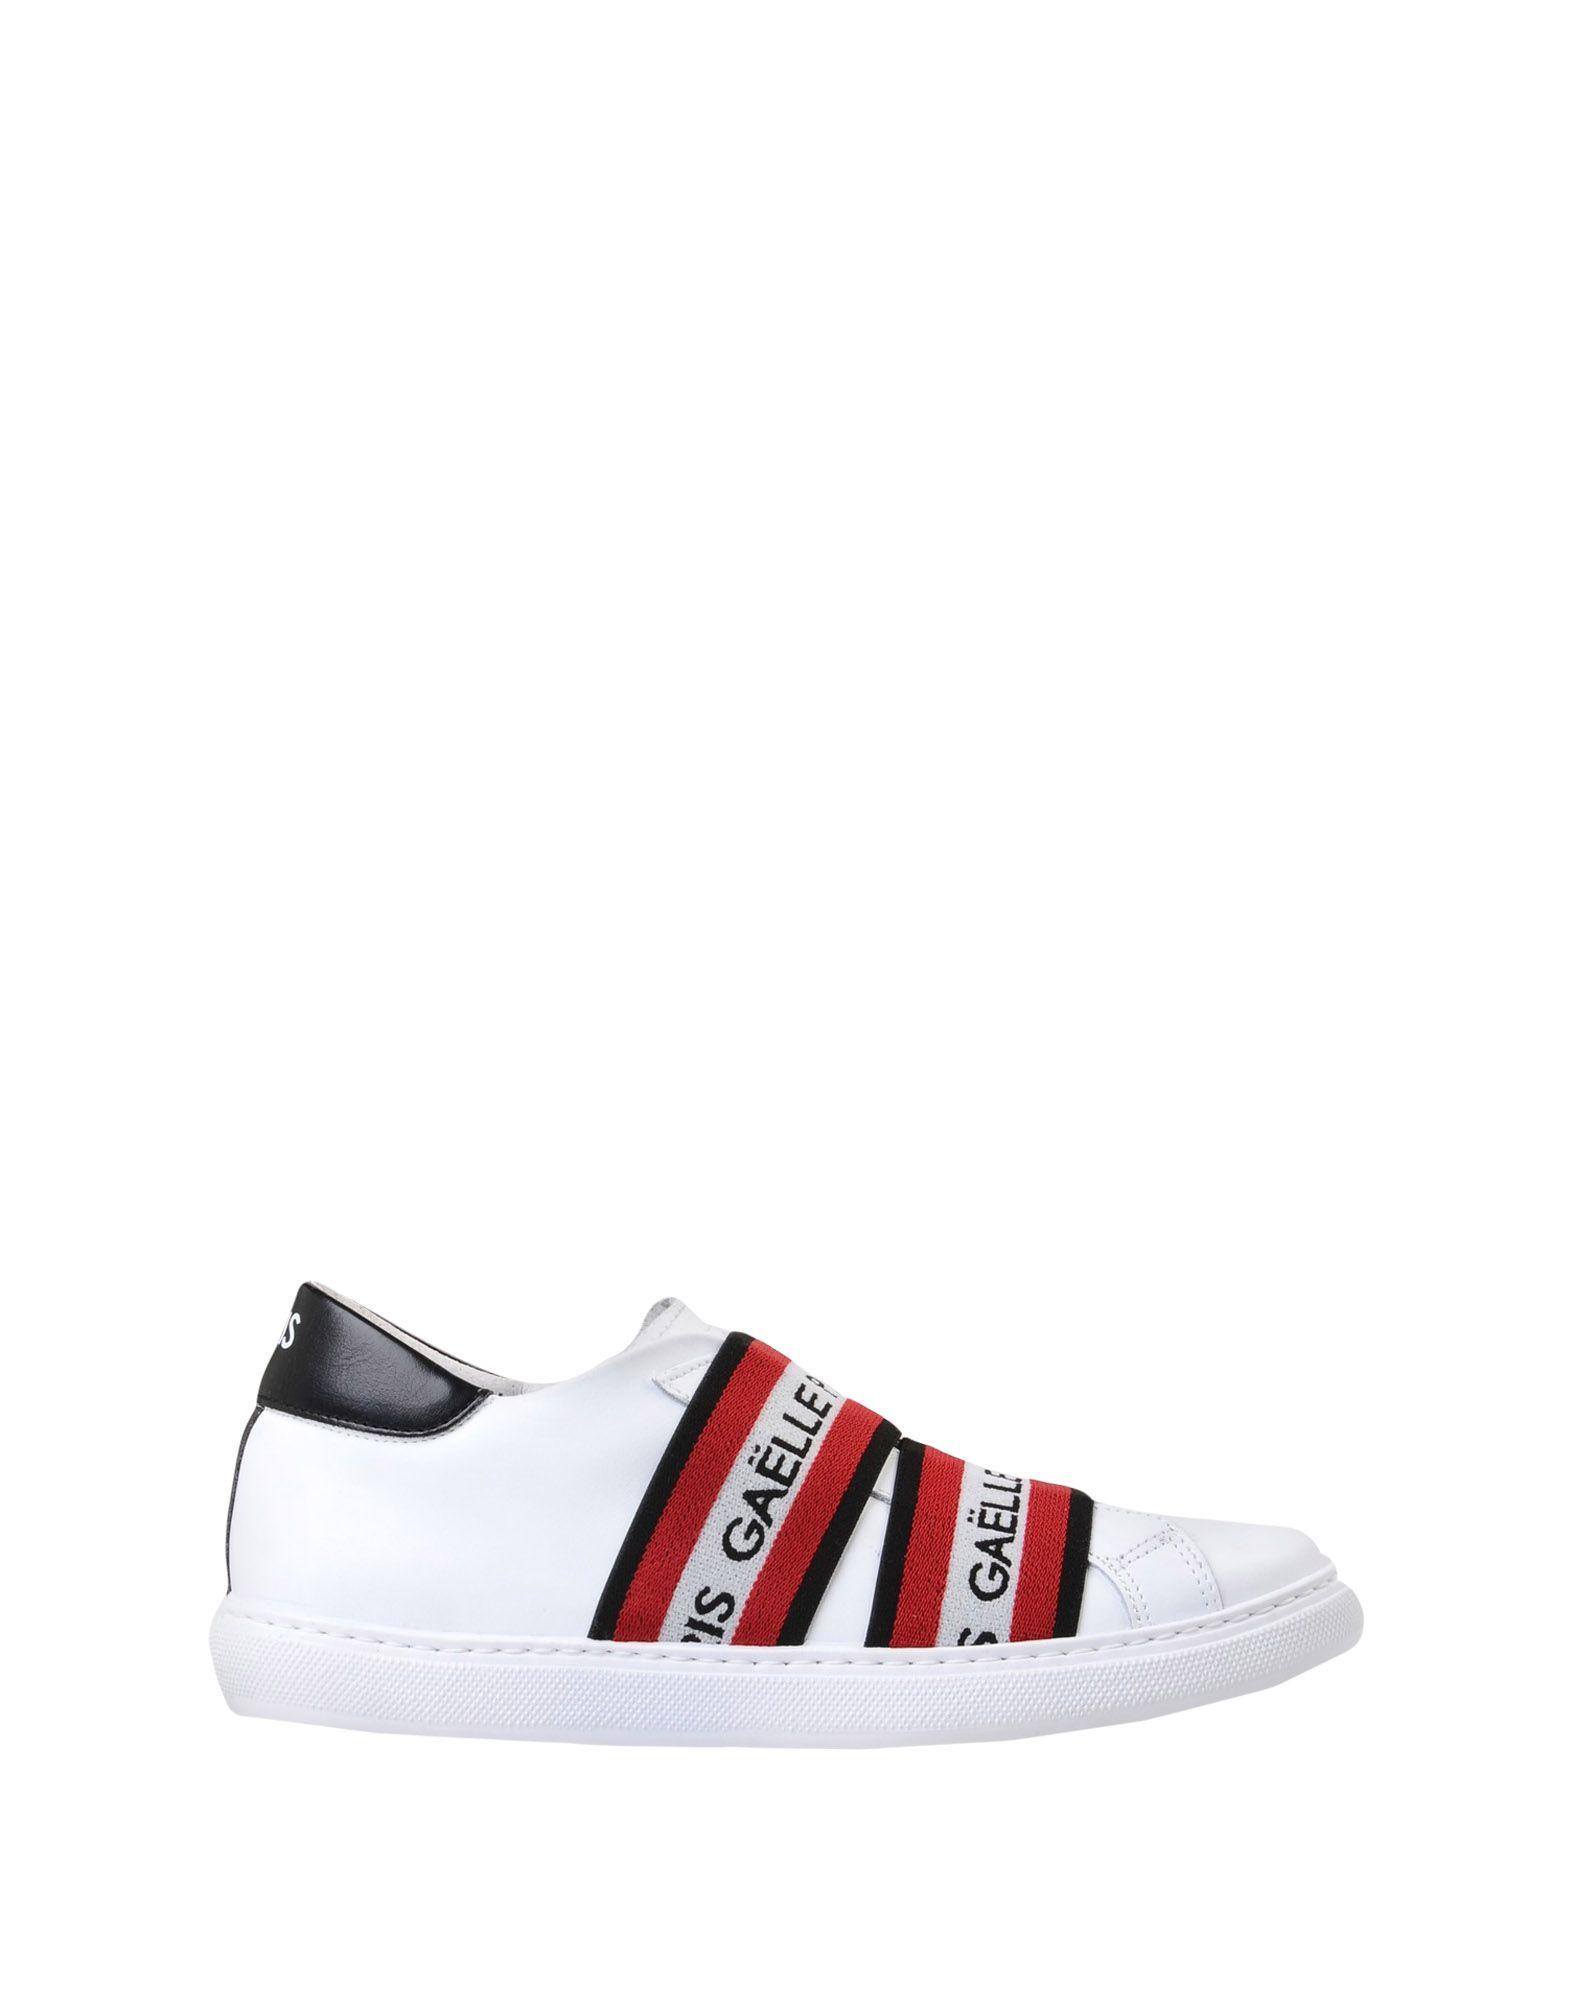 Gaëlle Paris Sneakers Sneakers Sneakers Damen  11463333II Beliebte Schuhe 061903